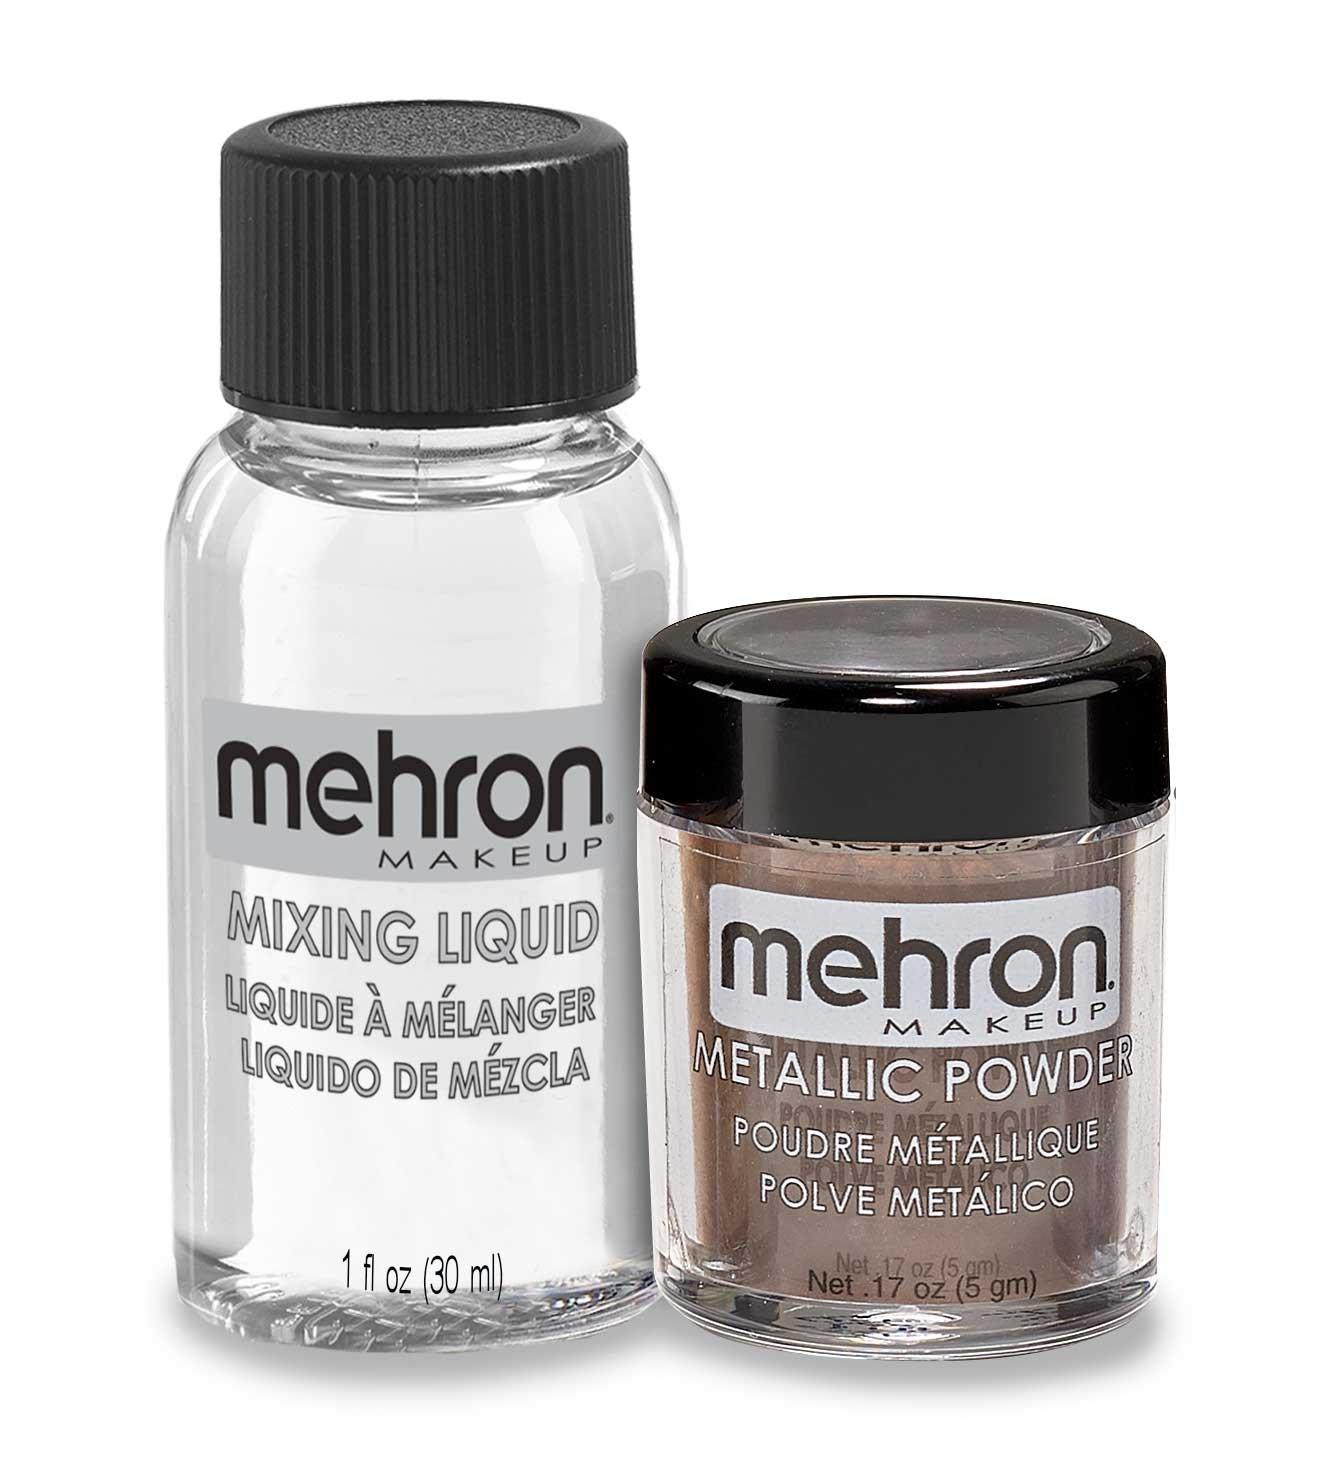 Mehron Makeup Metallic Powder (.17 oz) with Mixing Liquid (1 oz) (ROSE GOLD)